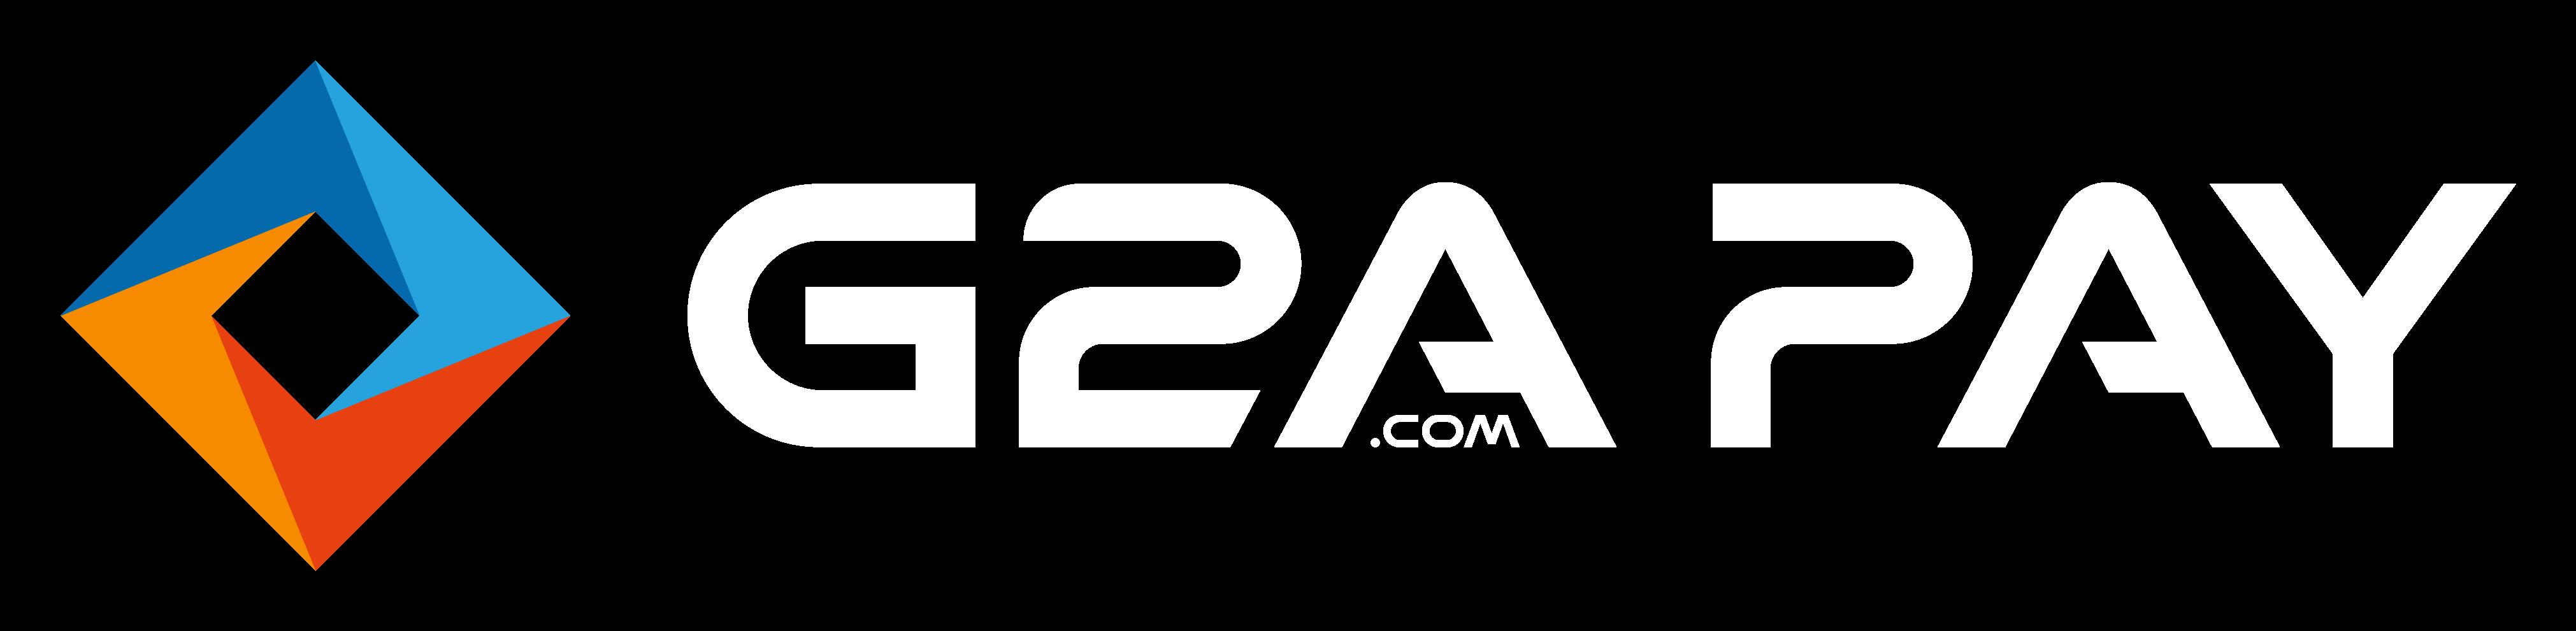 CSGOLive com | Top CS:GO Case Opening Site 2019